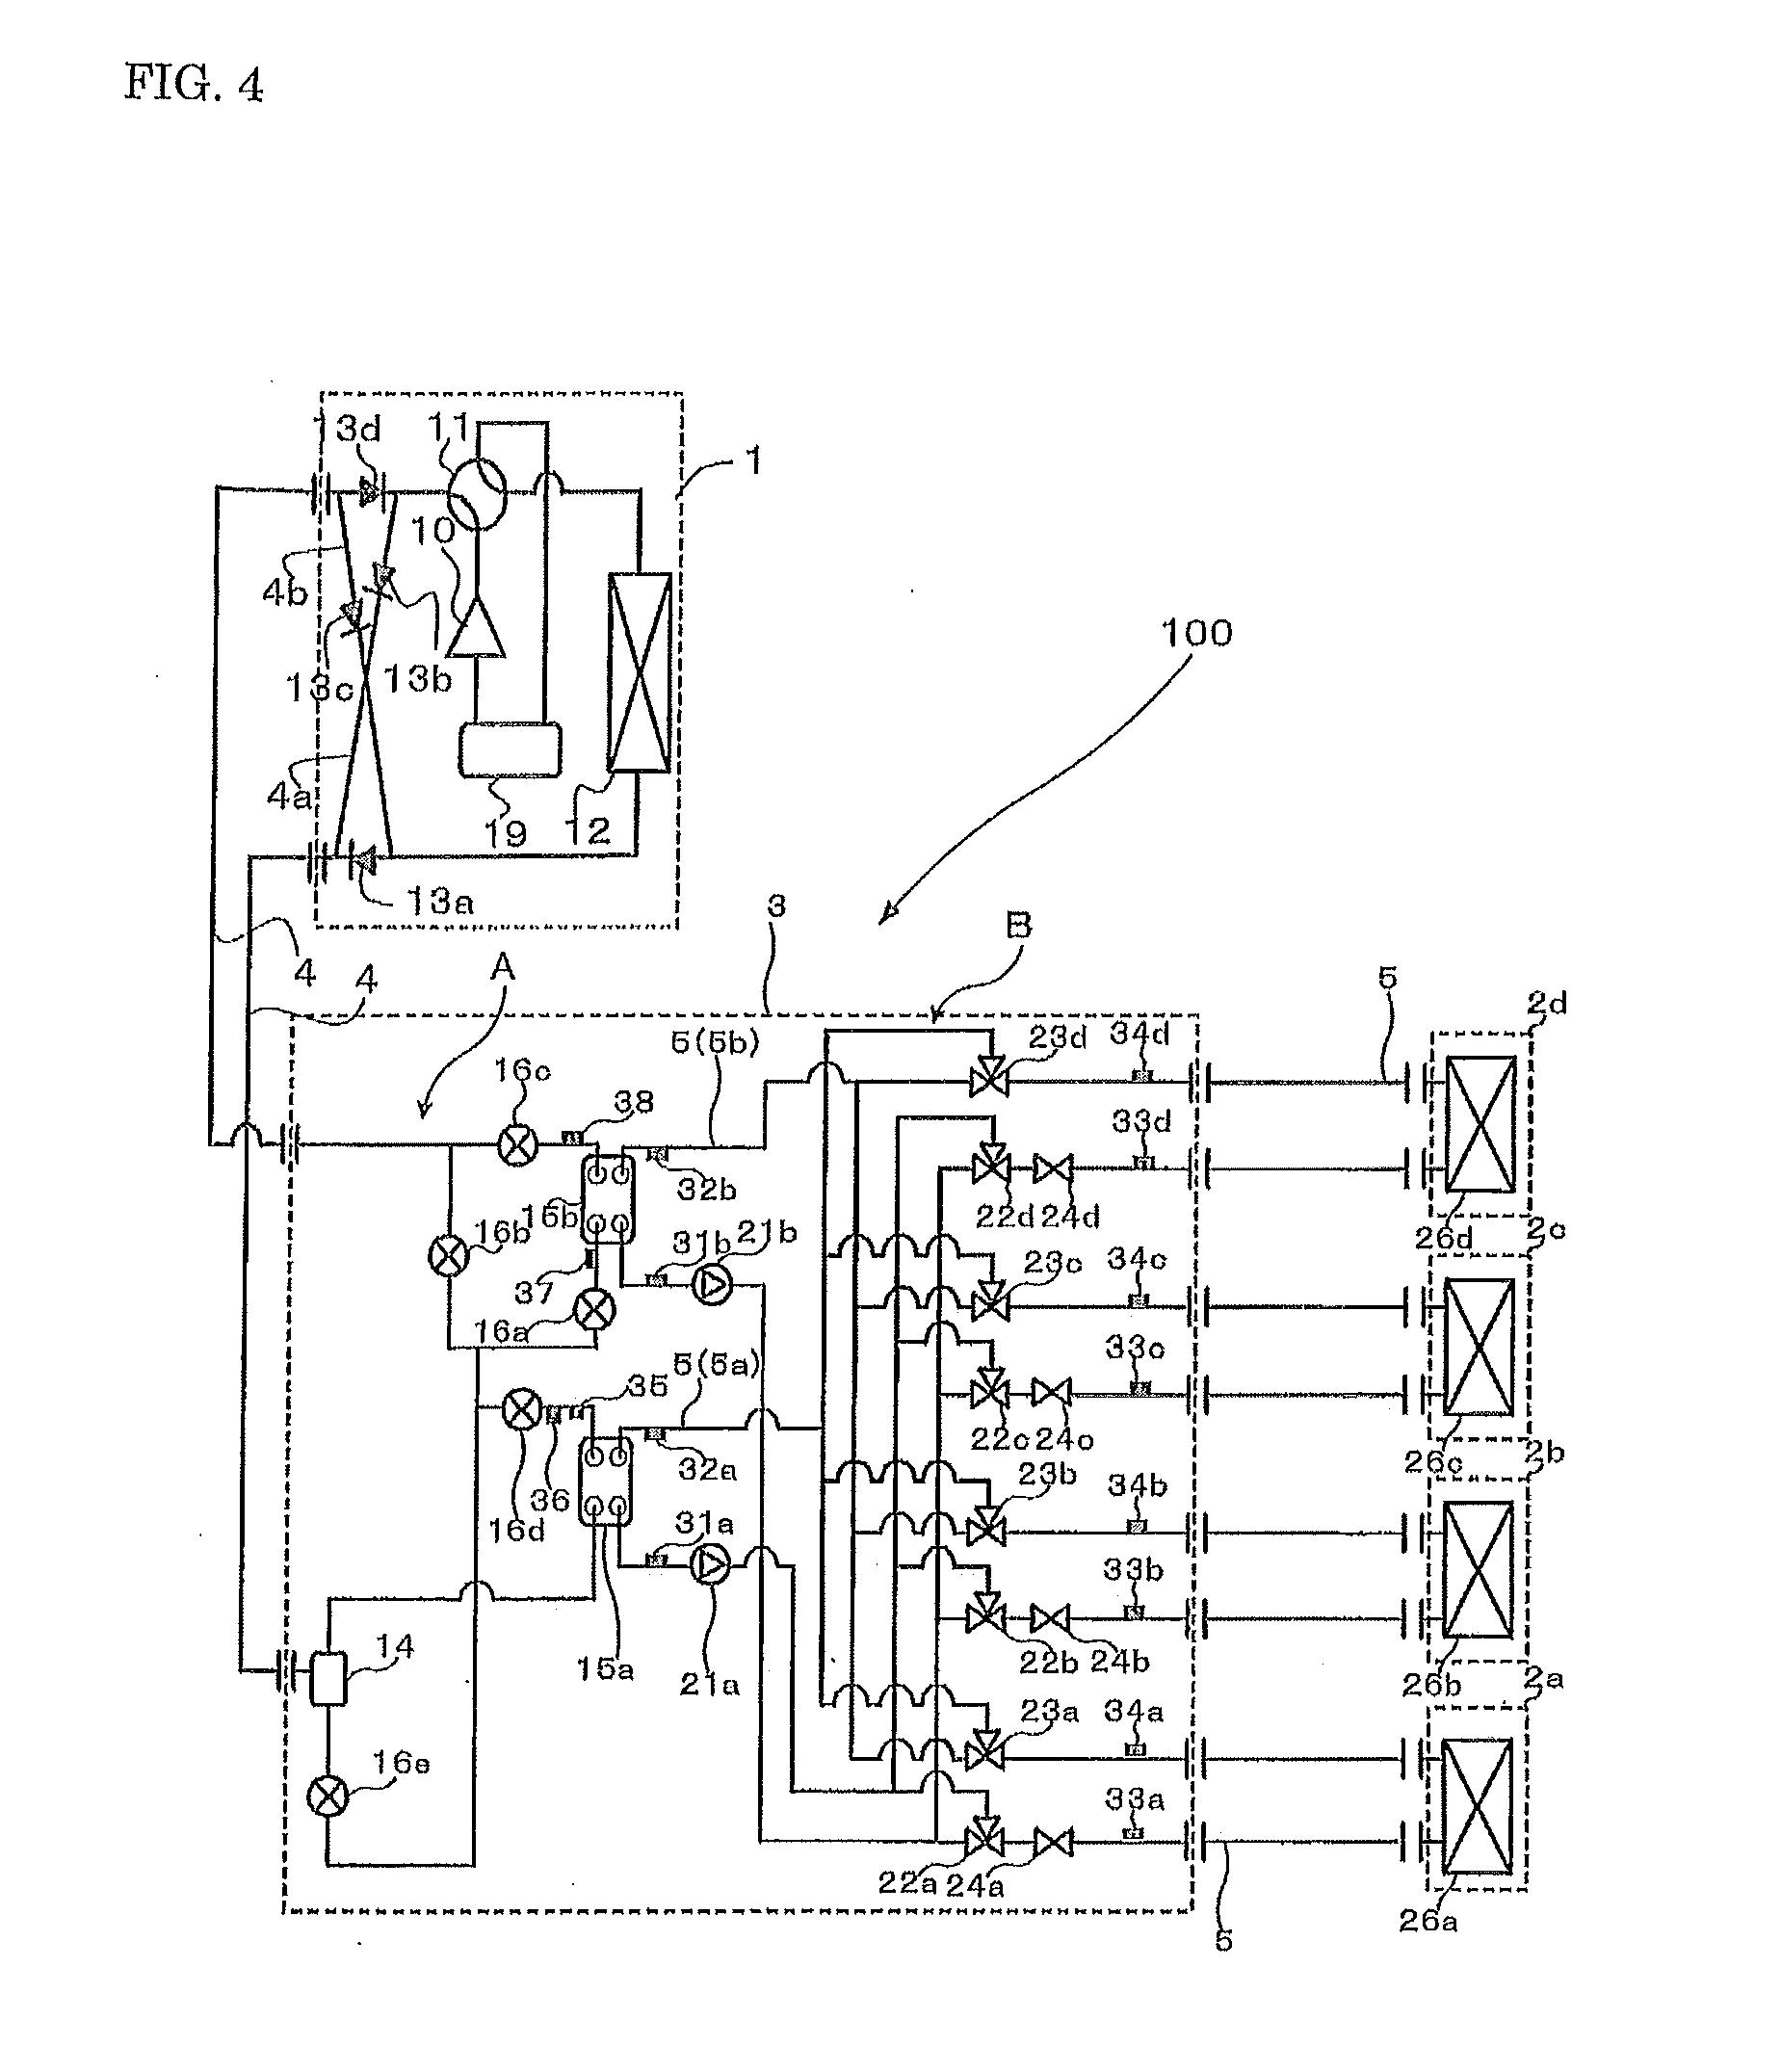 1995 mitsubishi 3000gt fuse box diagram